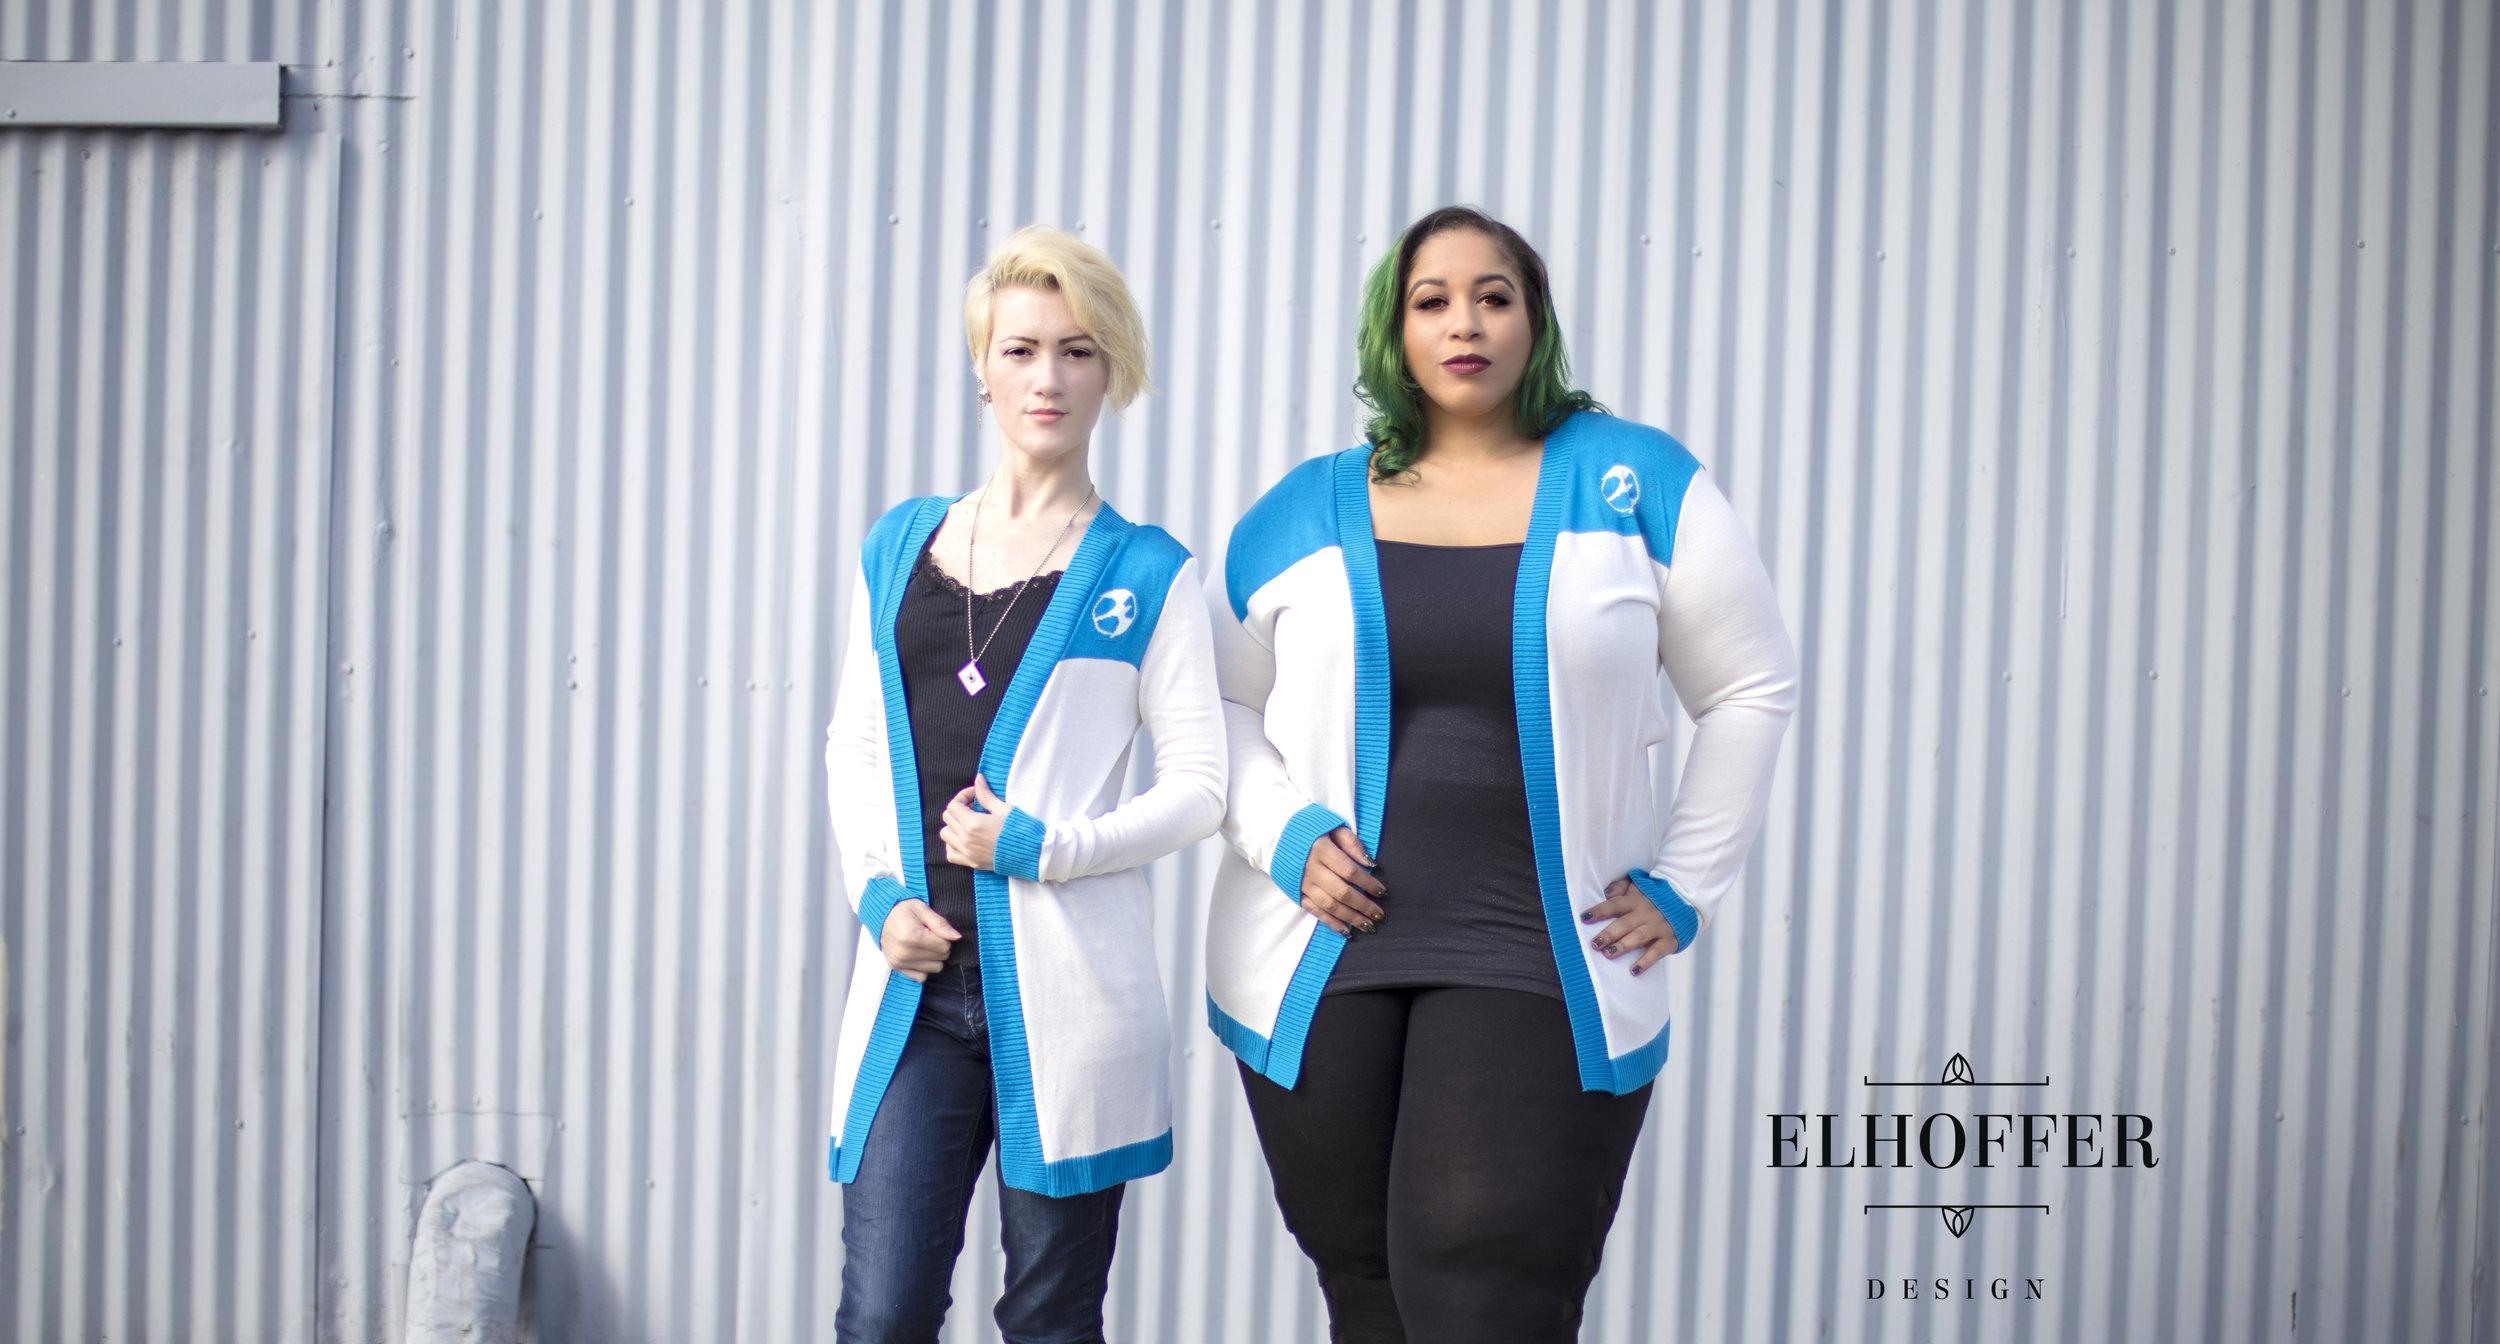 Jessie  (left) modeling a small longline cardigan and Dawn (right) modeling a 3XL longline cardigan. Photo credit: Elhoffer Design